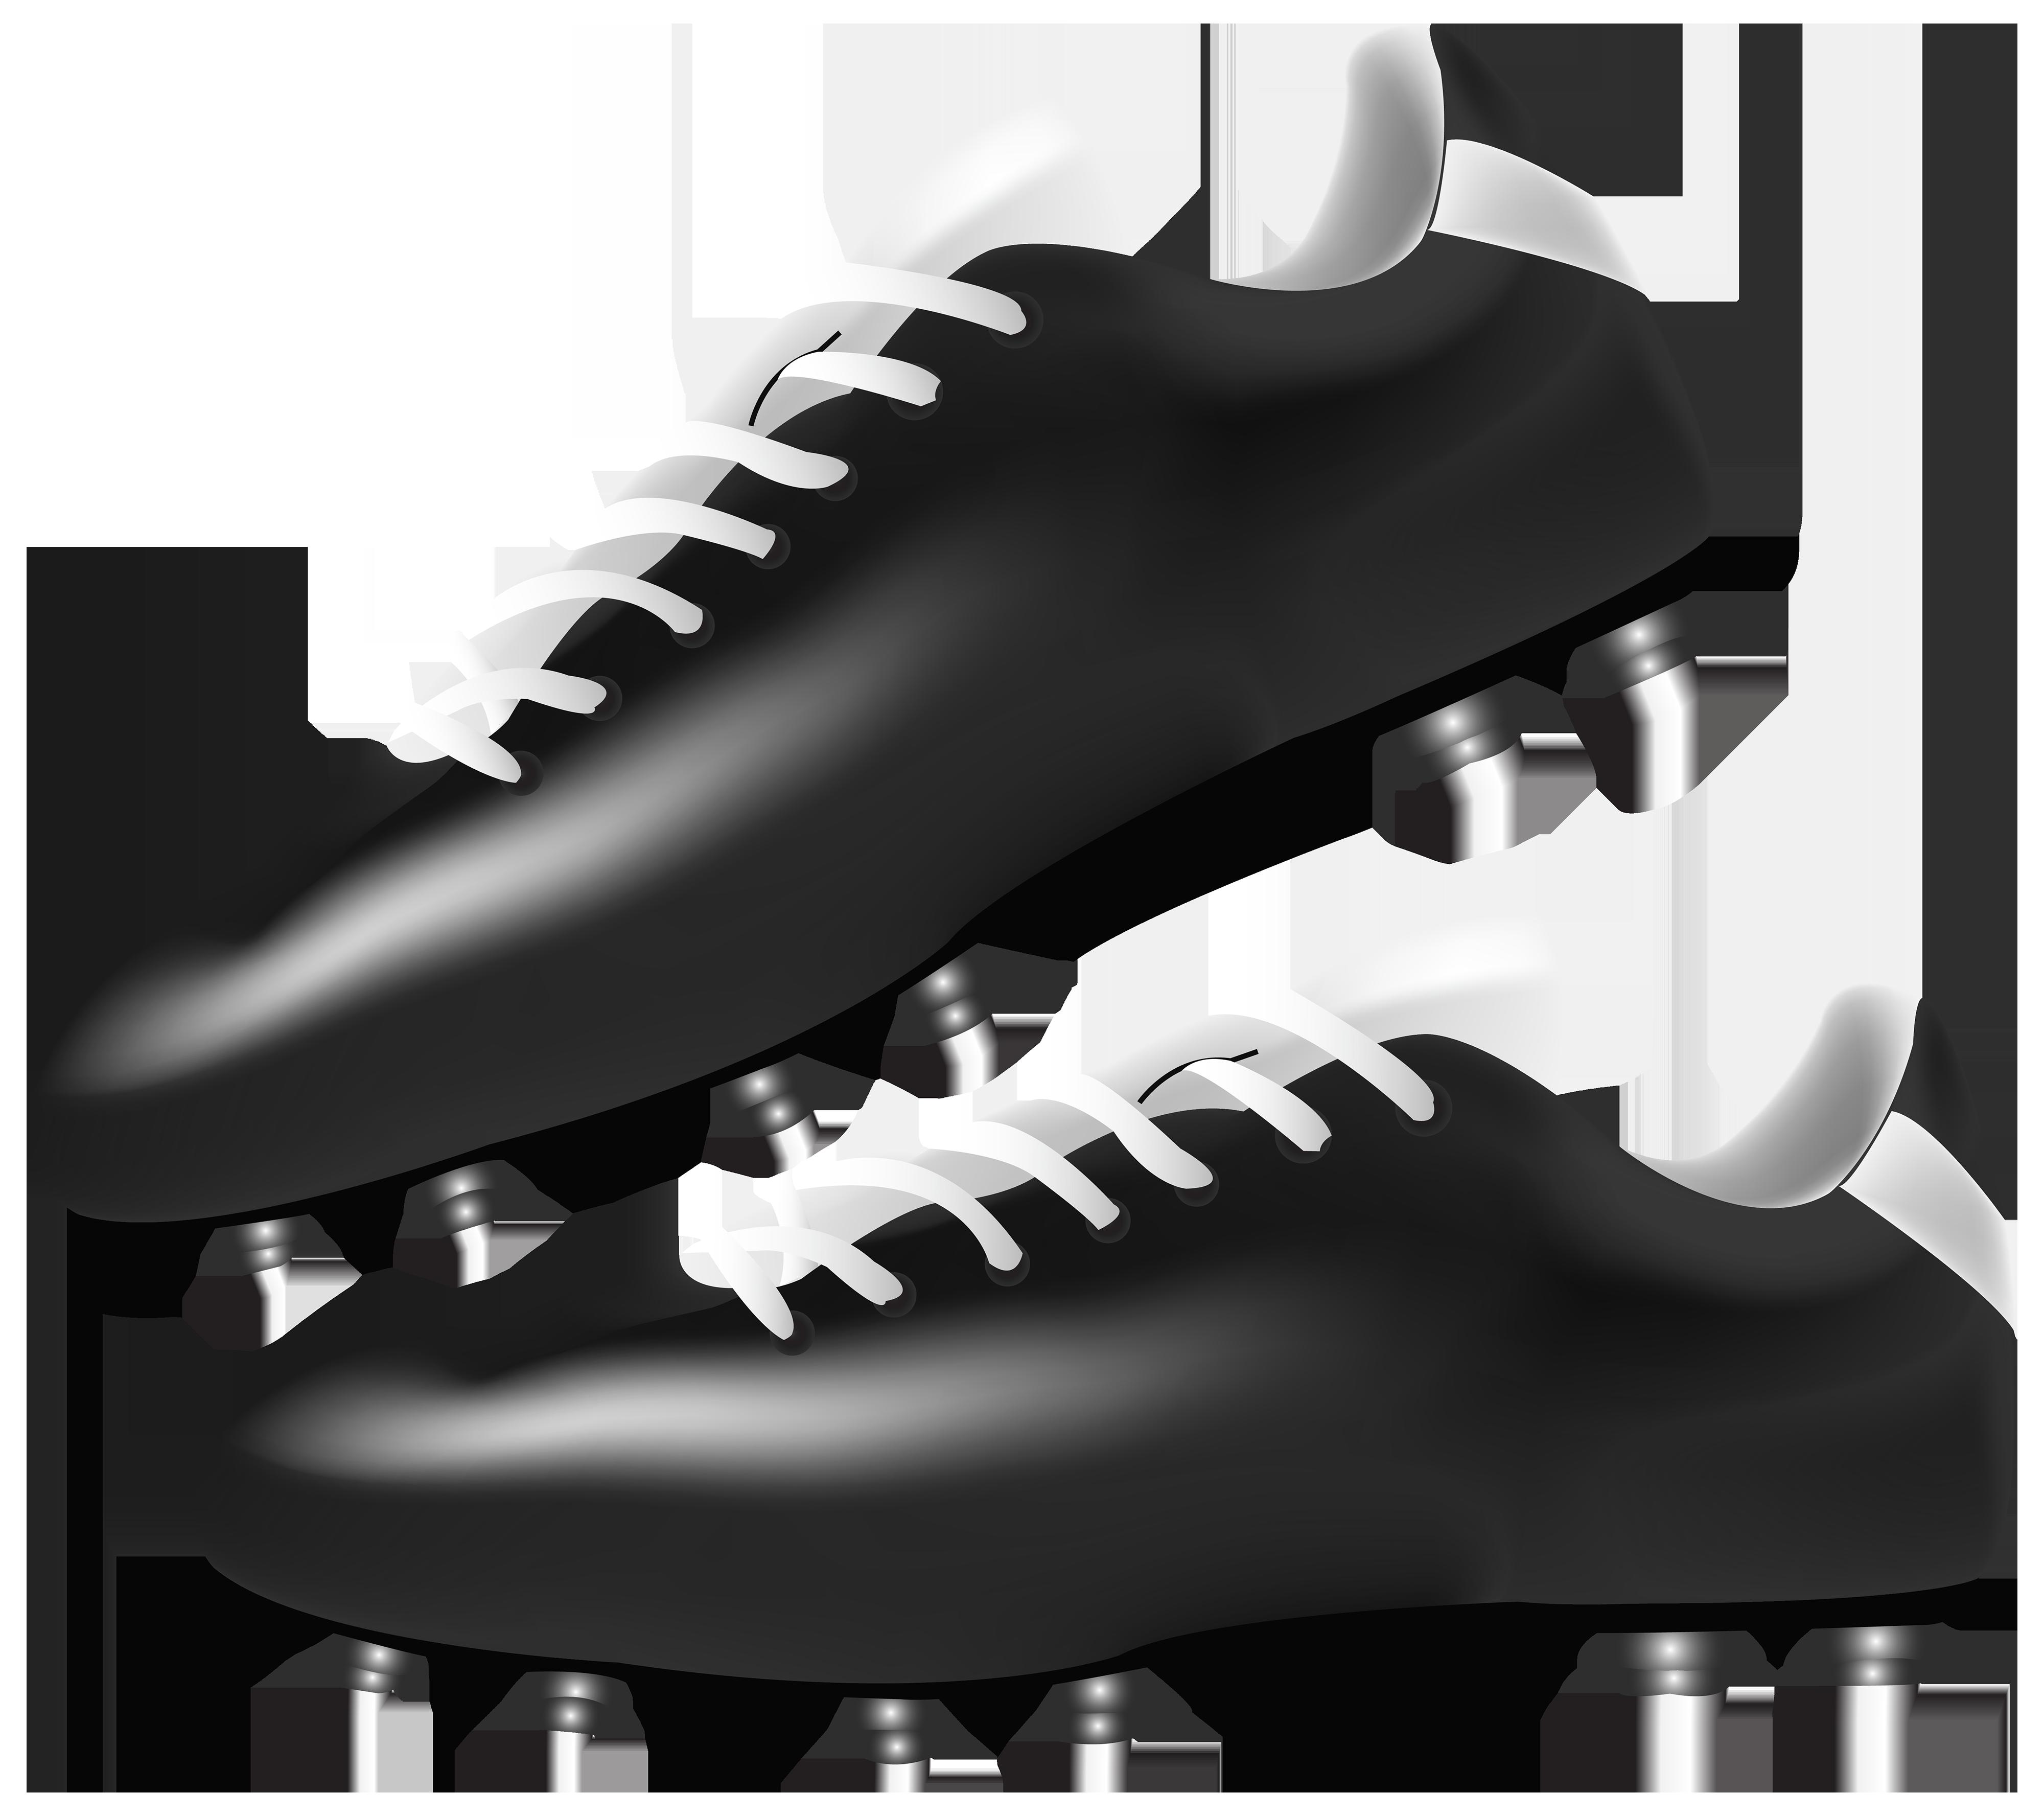 Football boots clipart #4